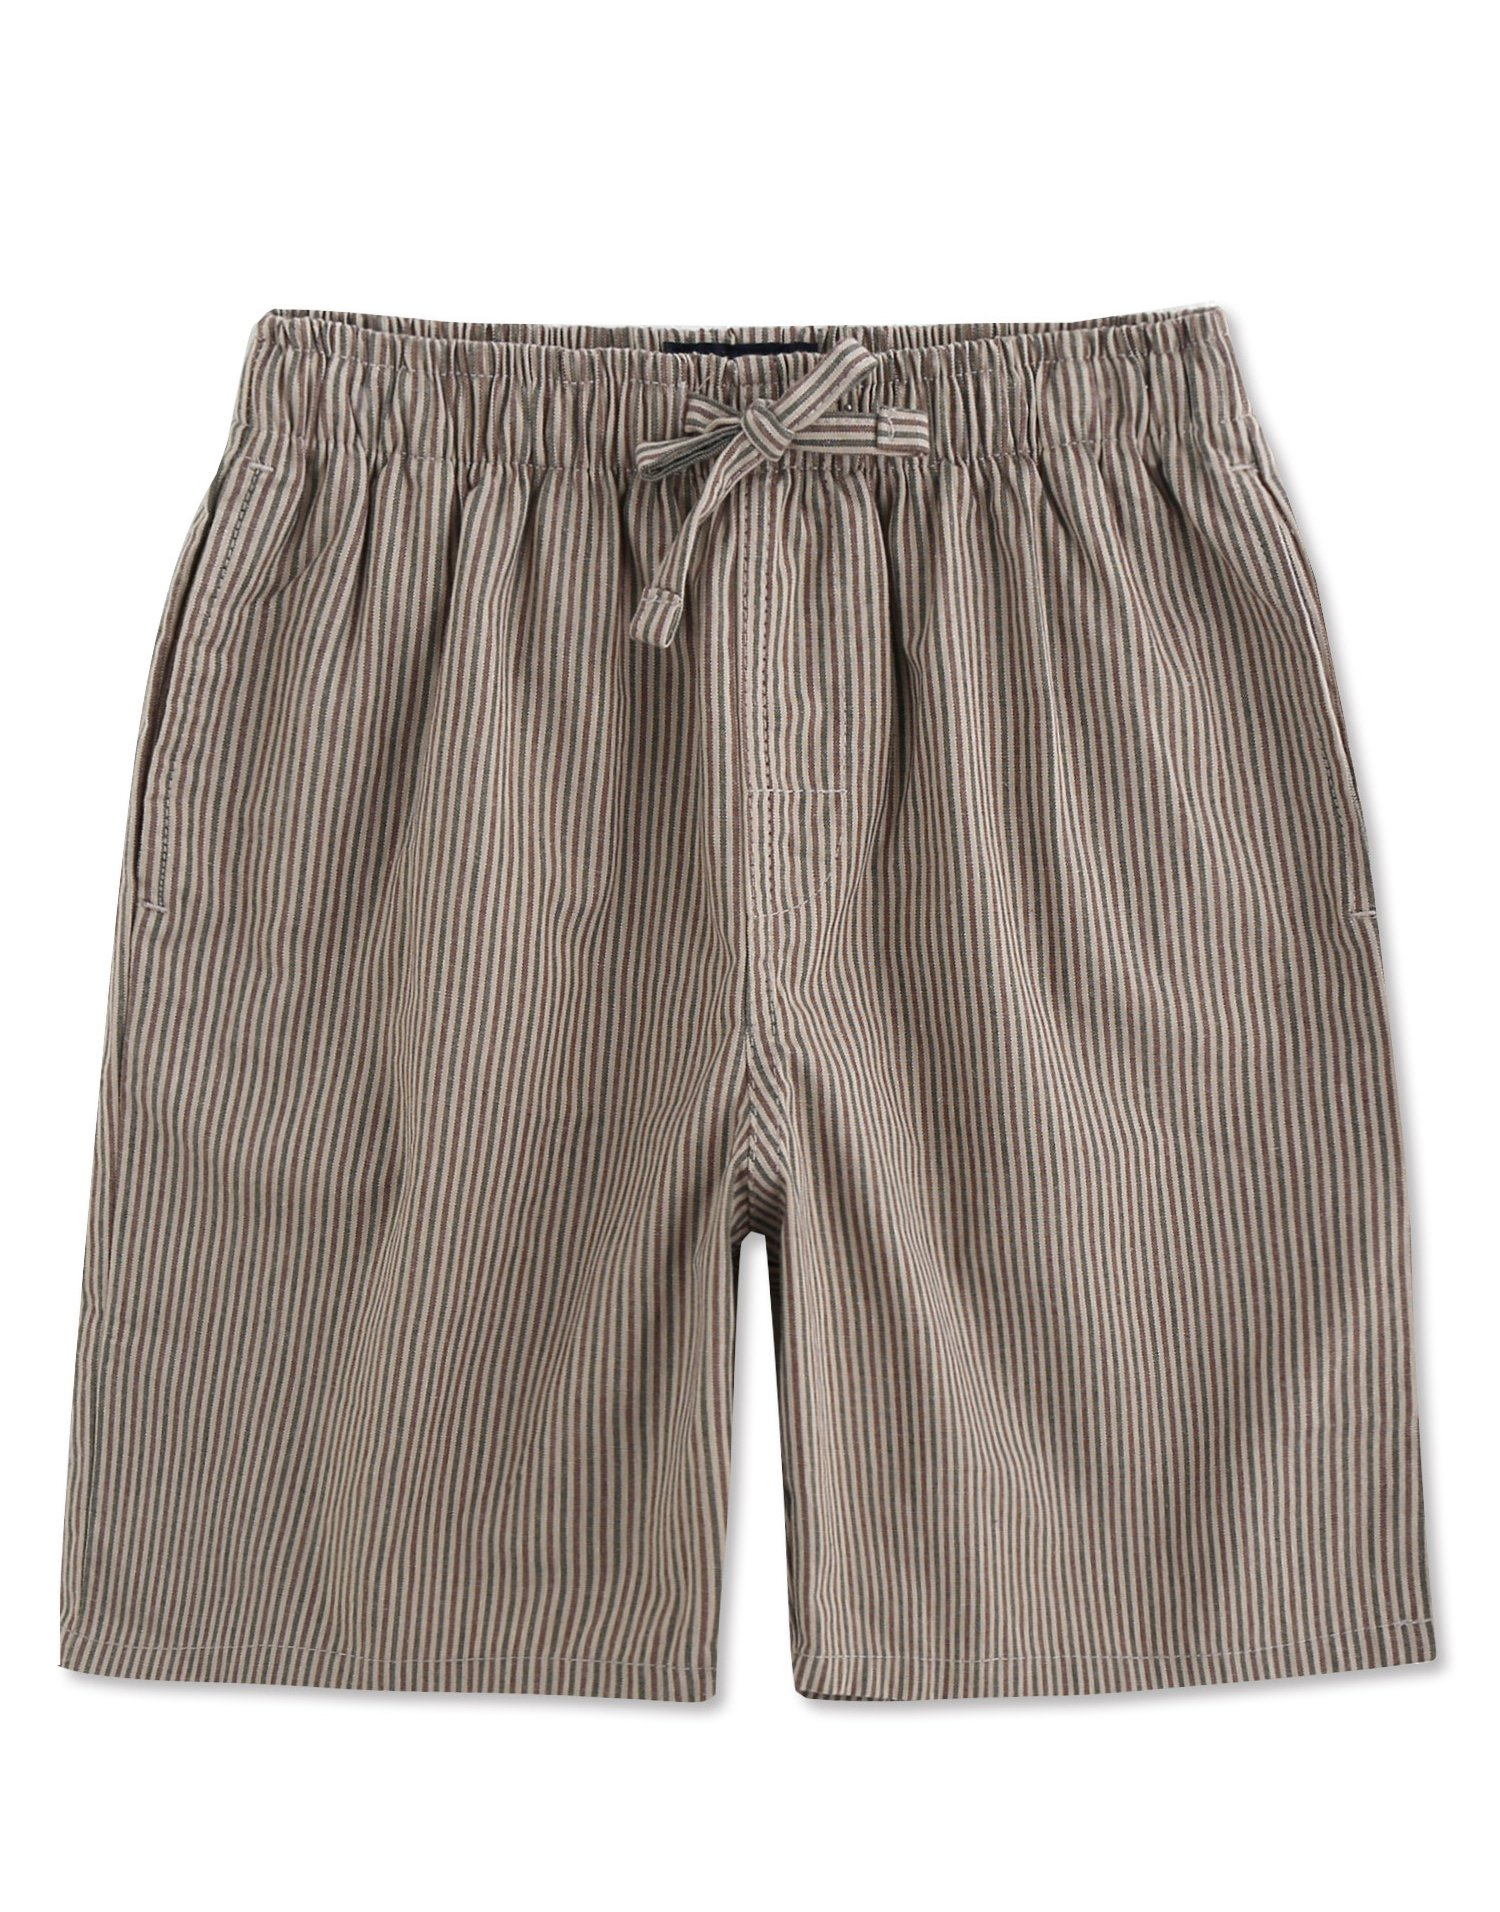 TINFL Men's Plaid Cotton Sleep Lounge Shorts Pajama Pants MSP-12-Khaki S